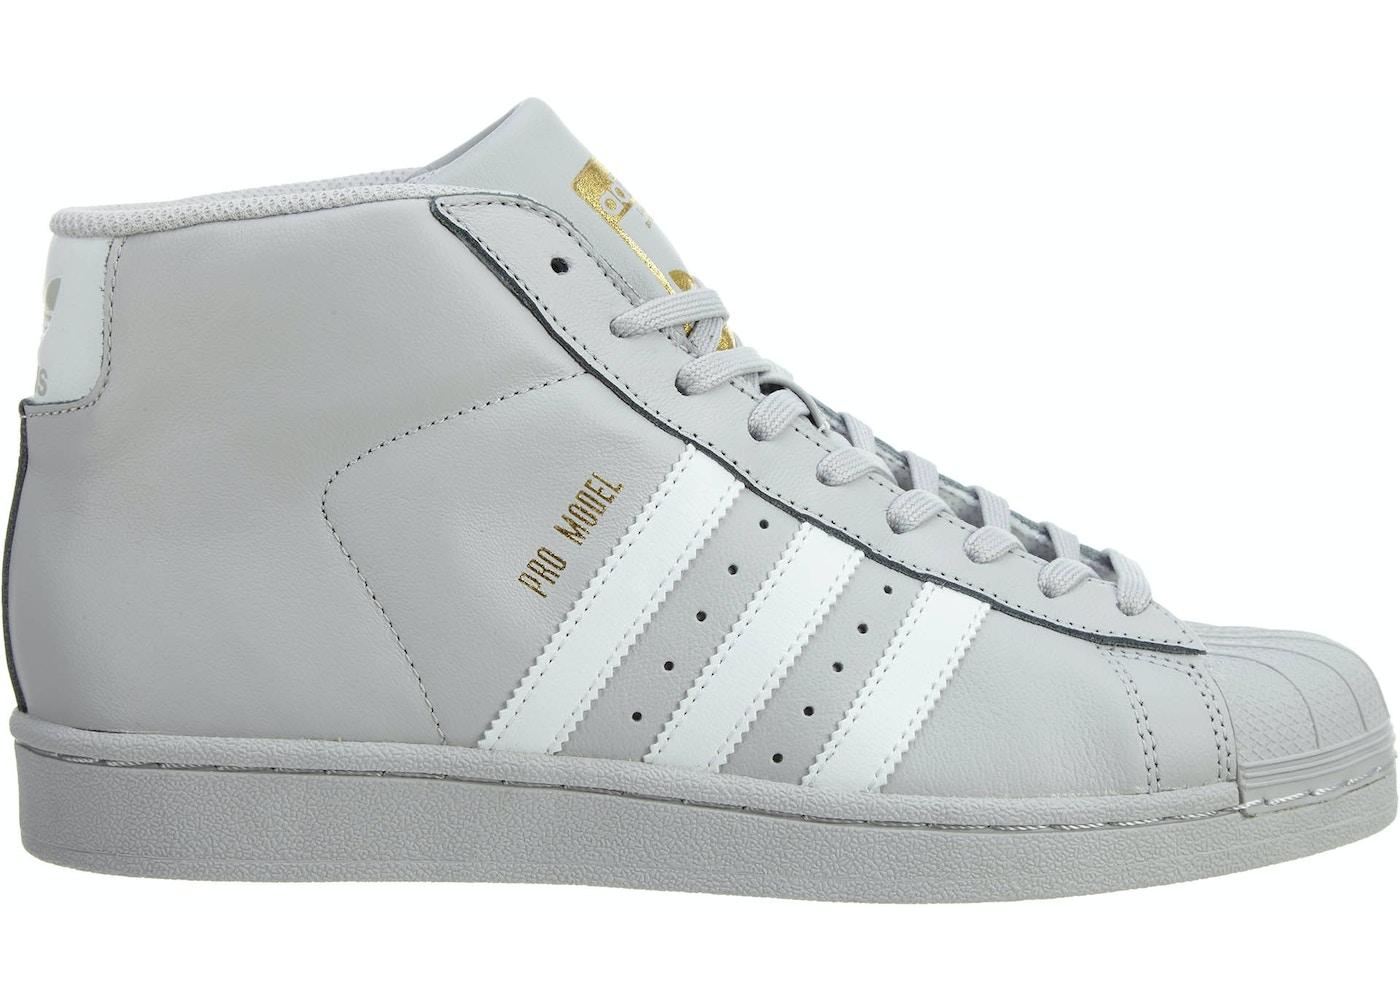 acheter pas cher 5a6f4 6285f adidas Pro Model Grey/White-Gold Metallic